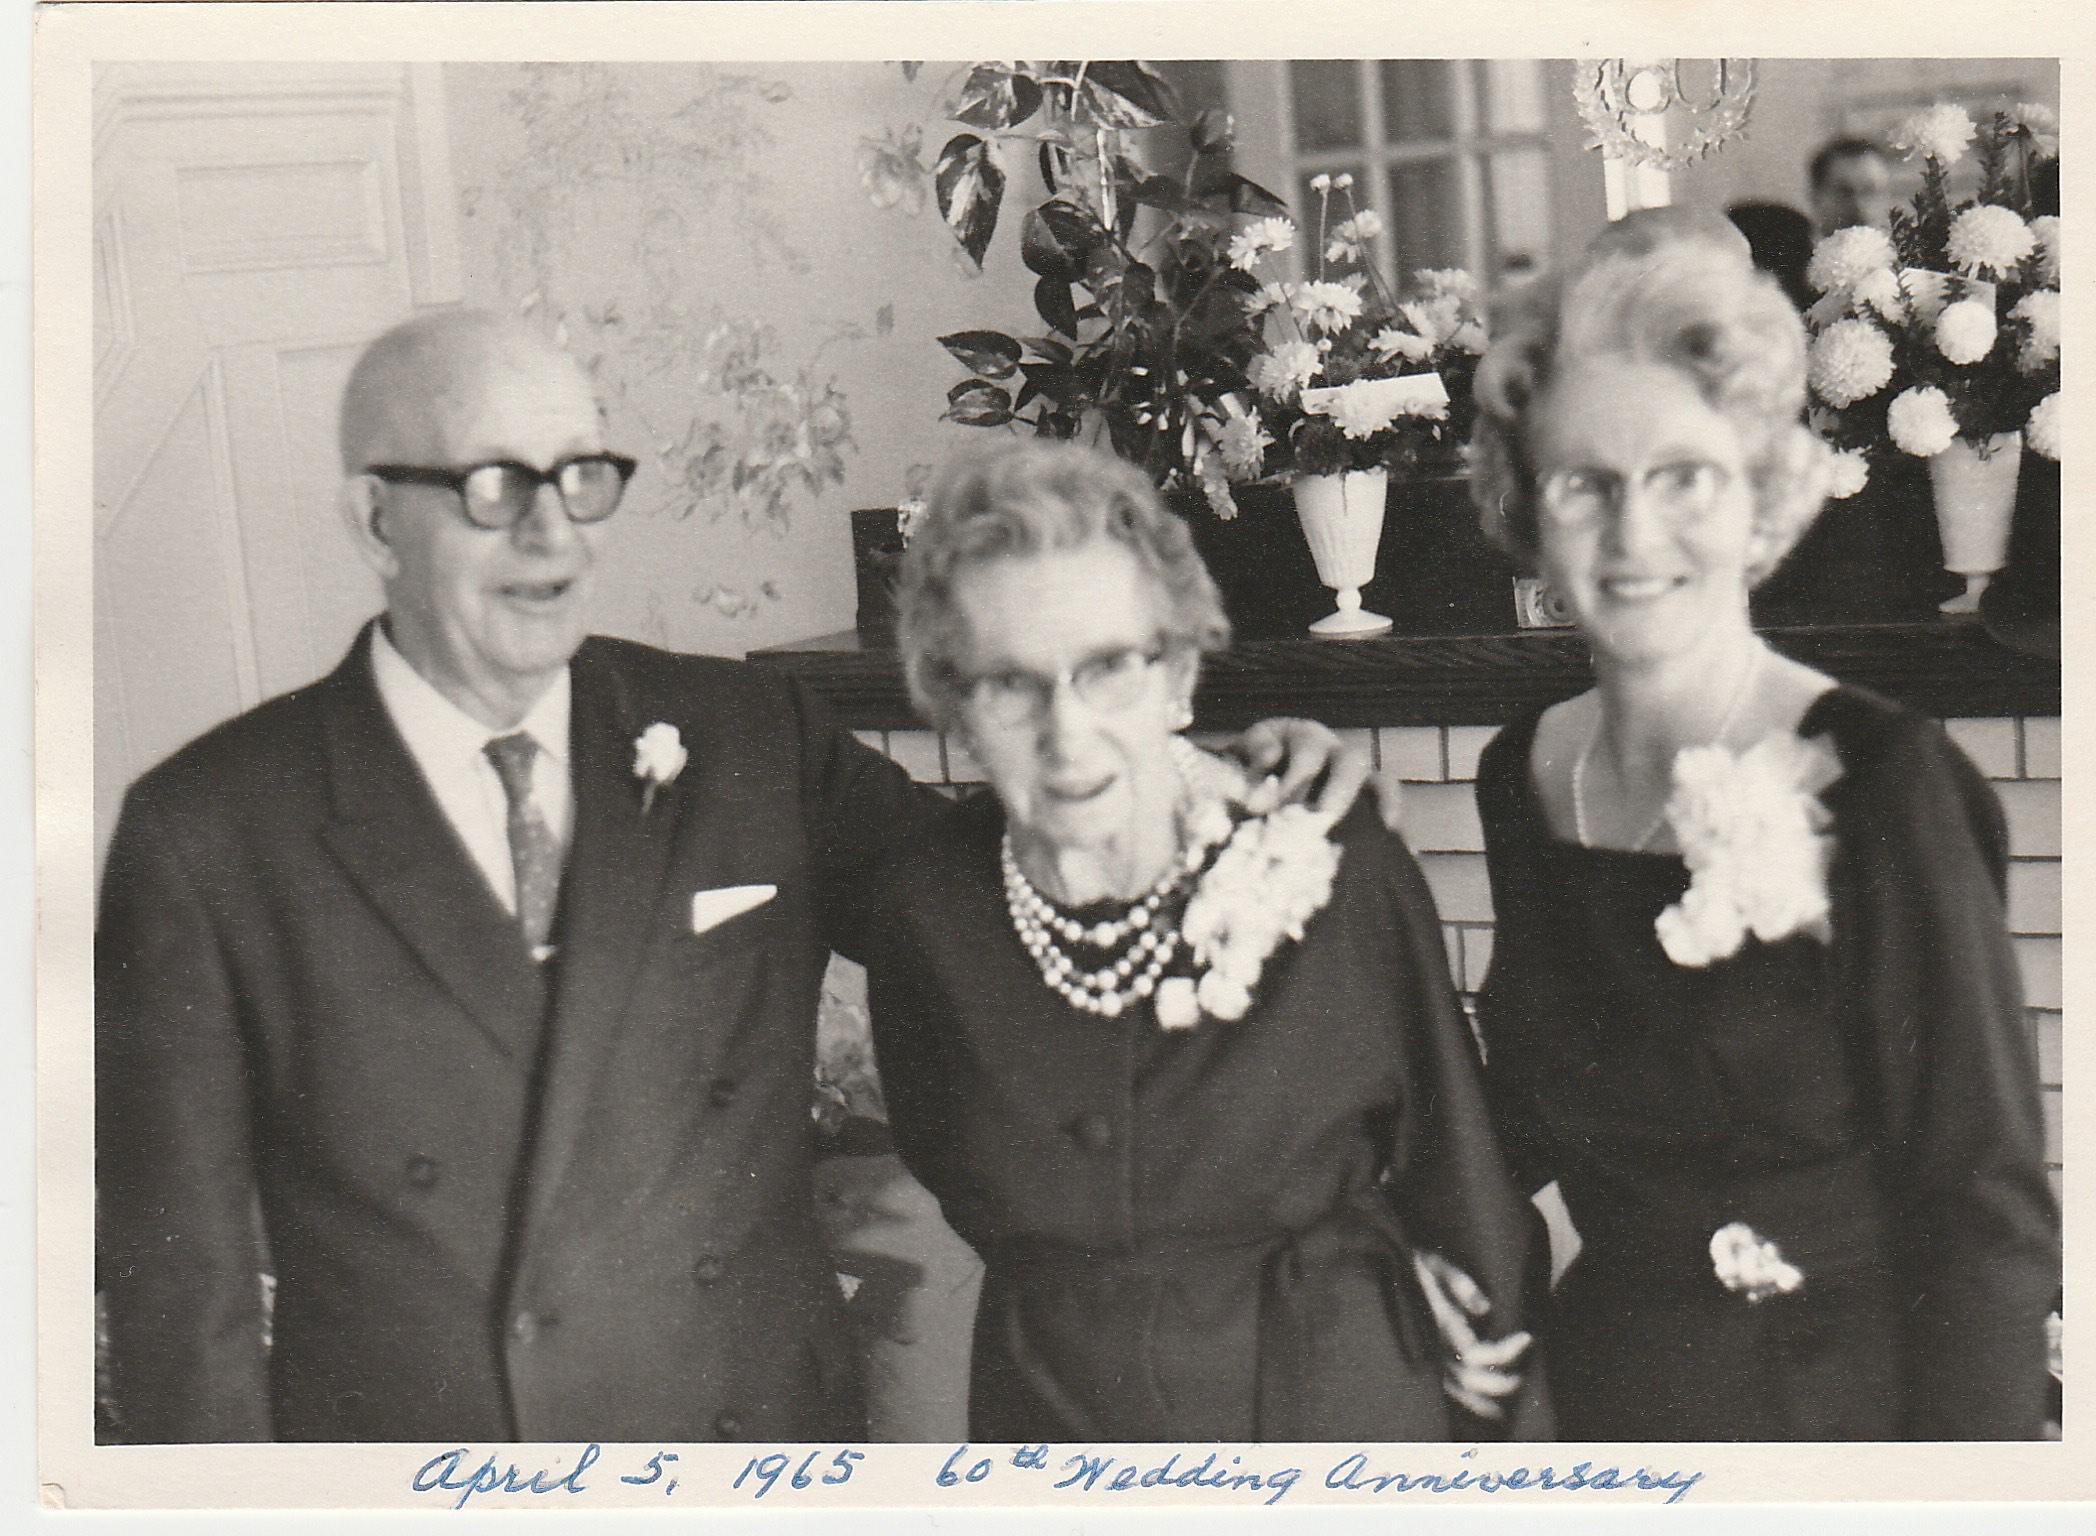 Mr. & Mrs. Bell had one child, Lorraine Hendershot. Lorraine & her husband Bill had one daughter, Carol and one son , John.